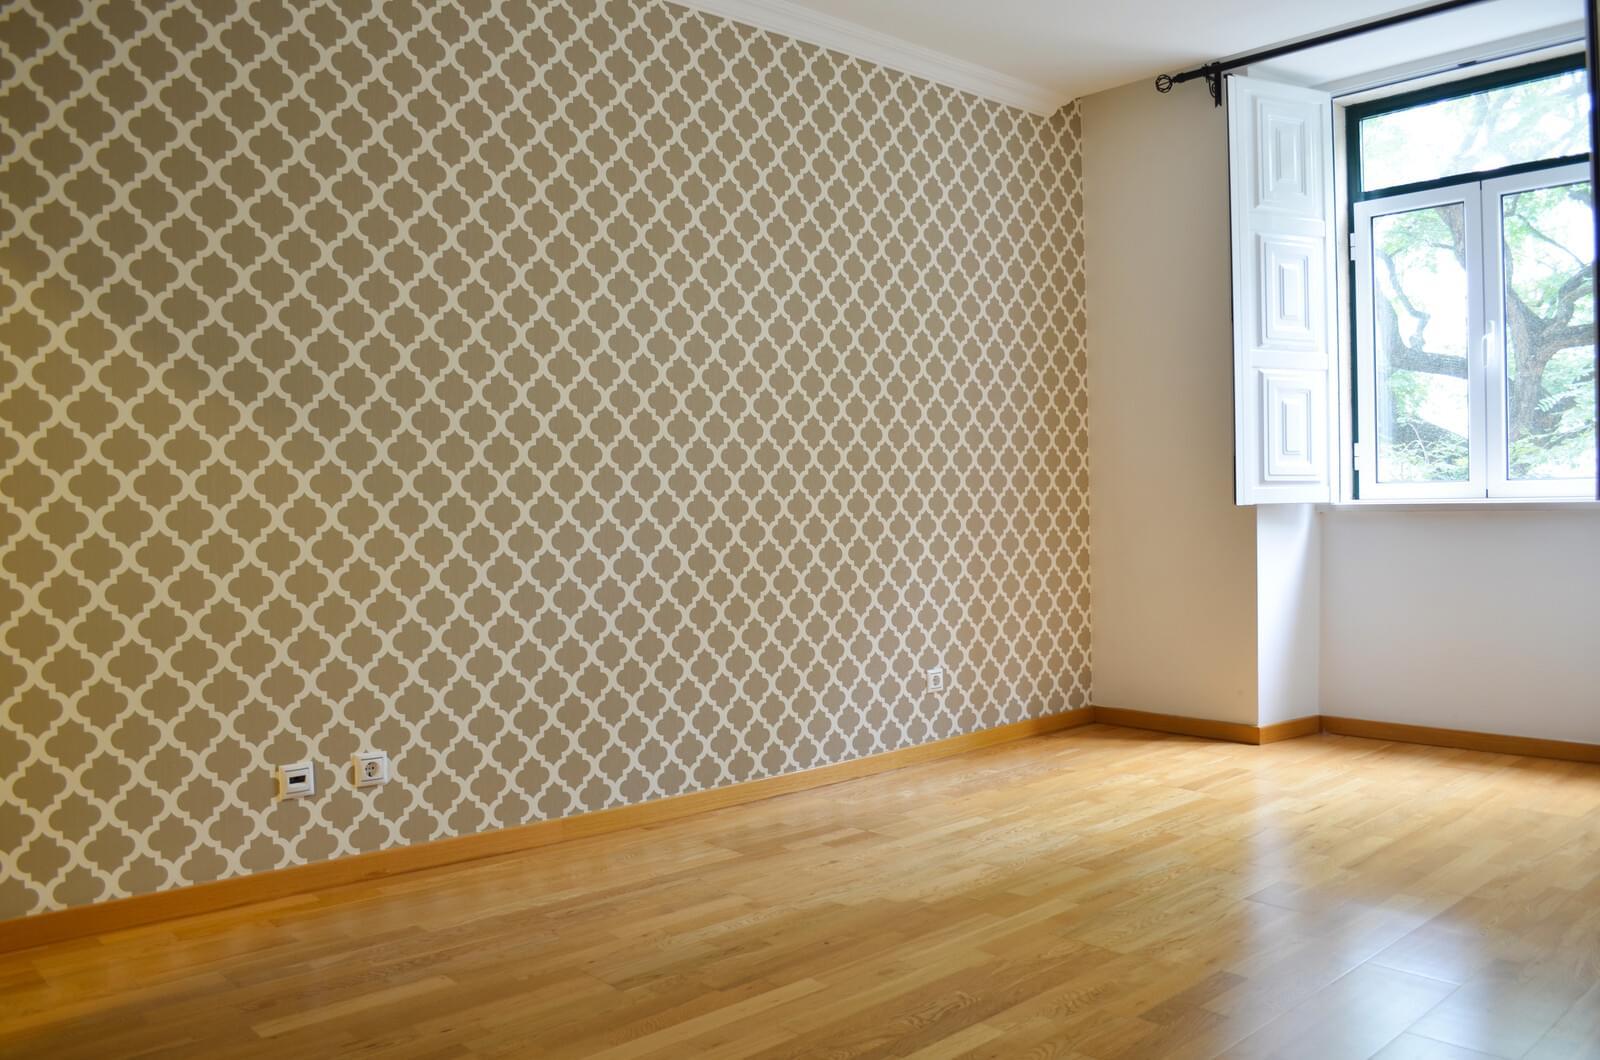 pf18839-apartamento-t2-lisboa-efe76a89-f7c0-414c-beb0-bc9bf5da0084